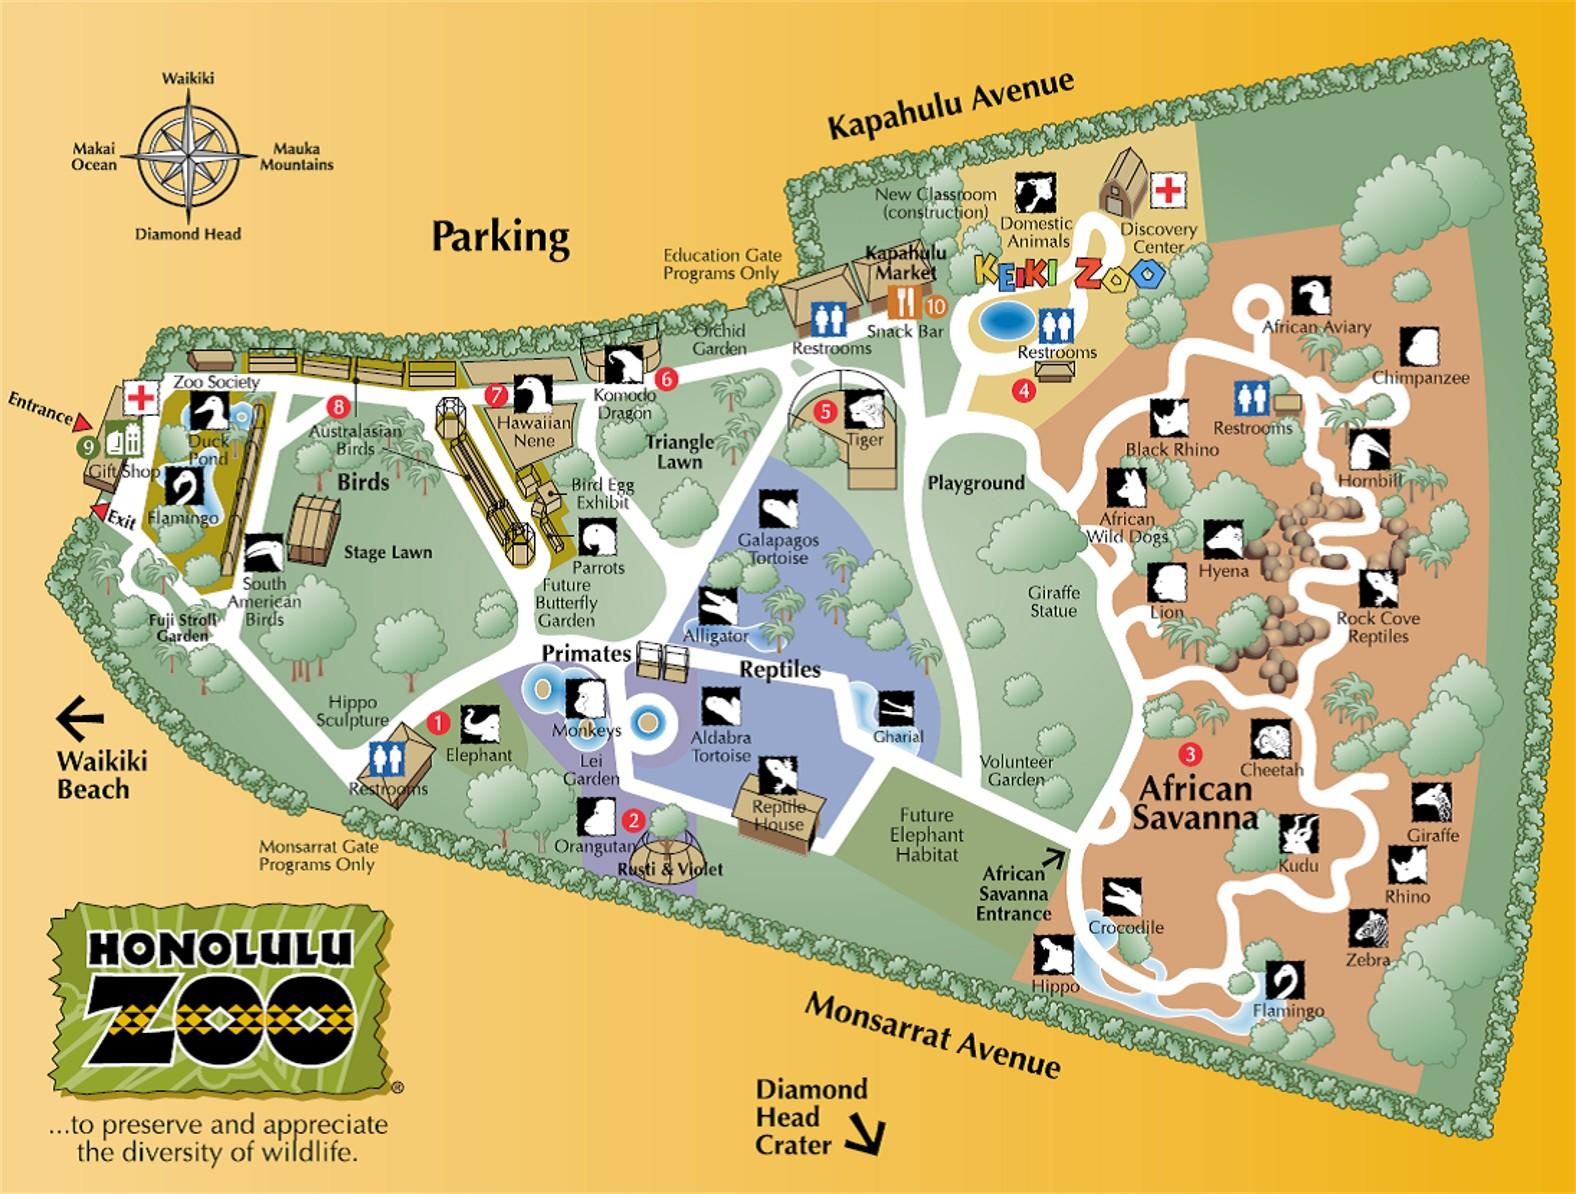 Honolulu Zoo Map 151 Kapahulu Ave Honolulu HIlrm mappery – Honolulu Tourist Attractions Map